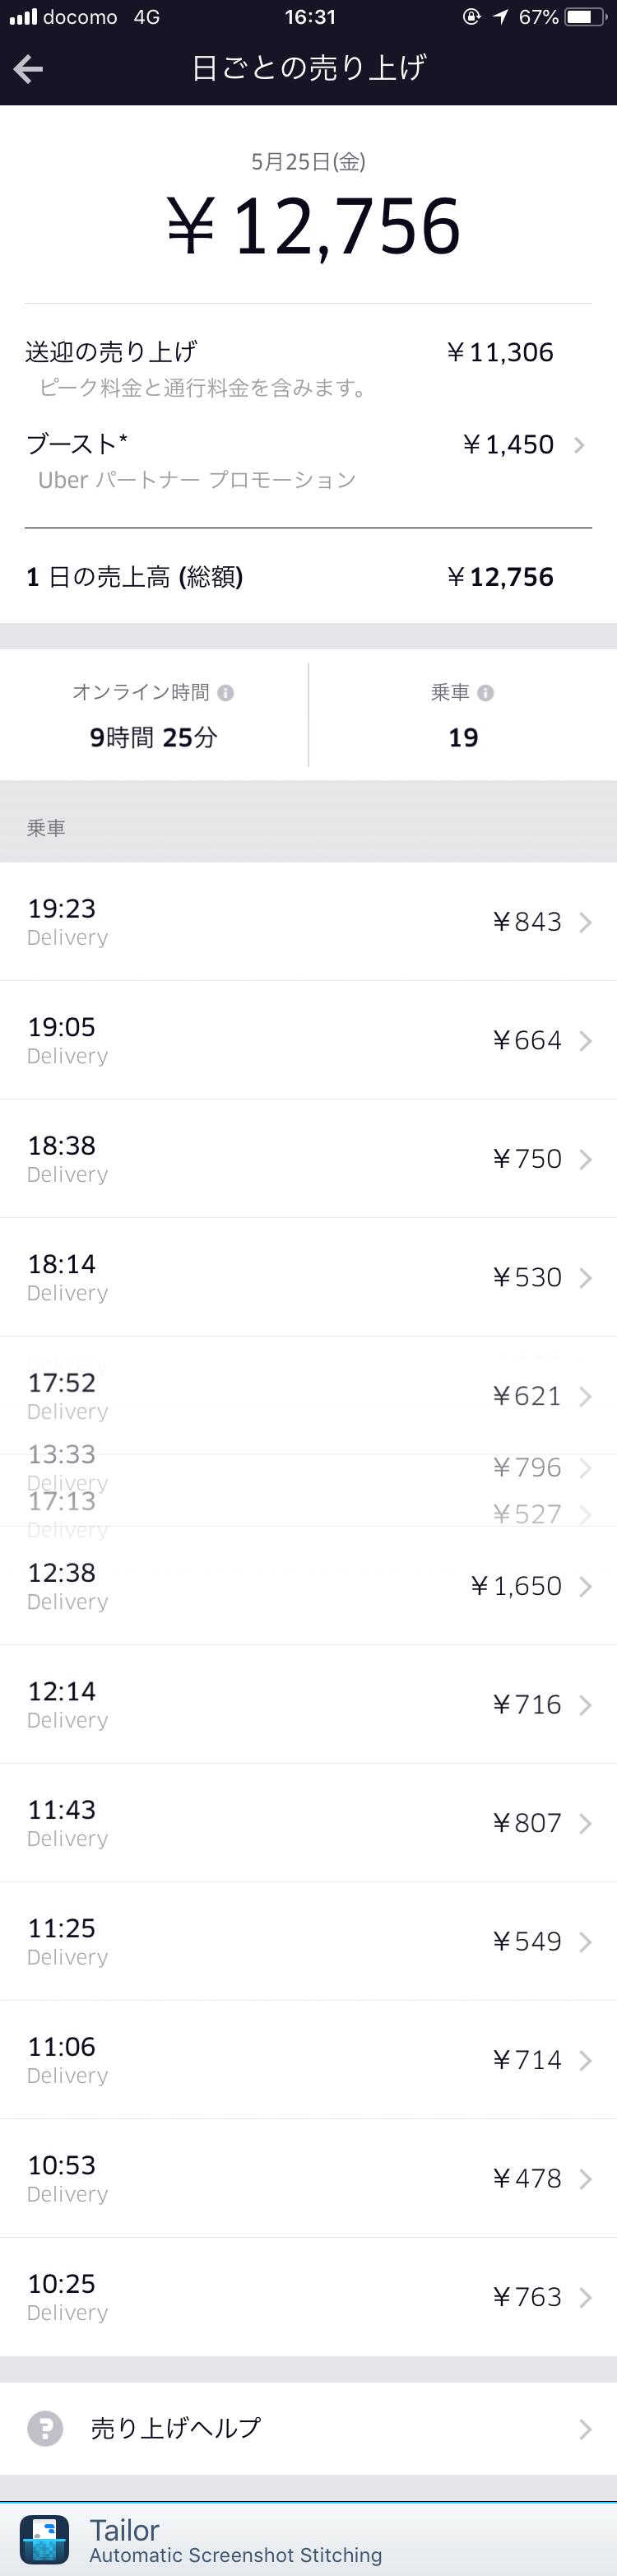 Uber Eats5月25日の配達記録